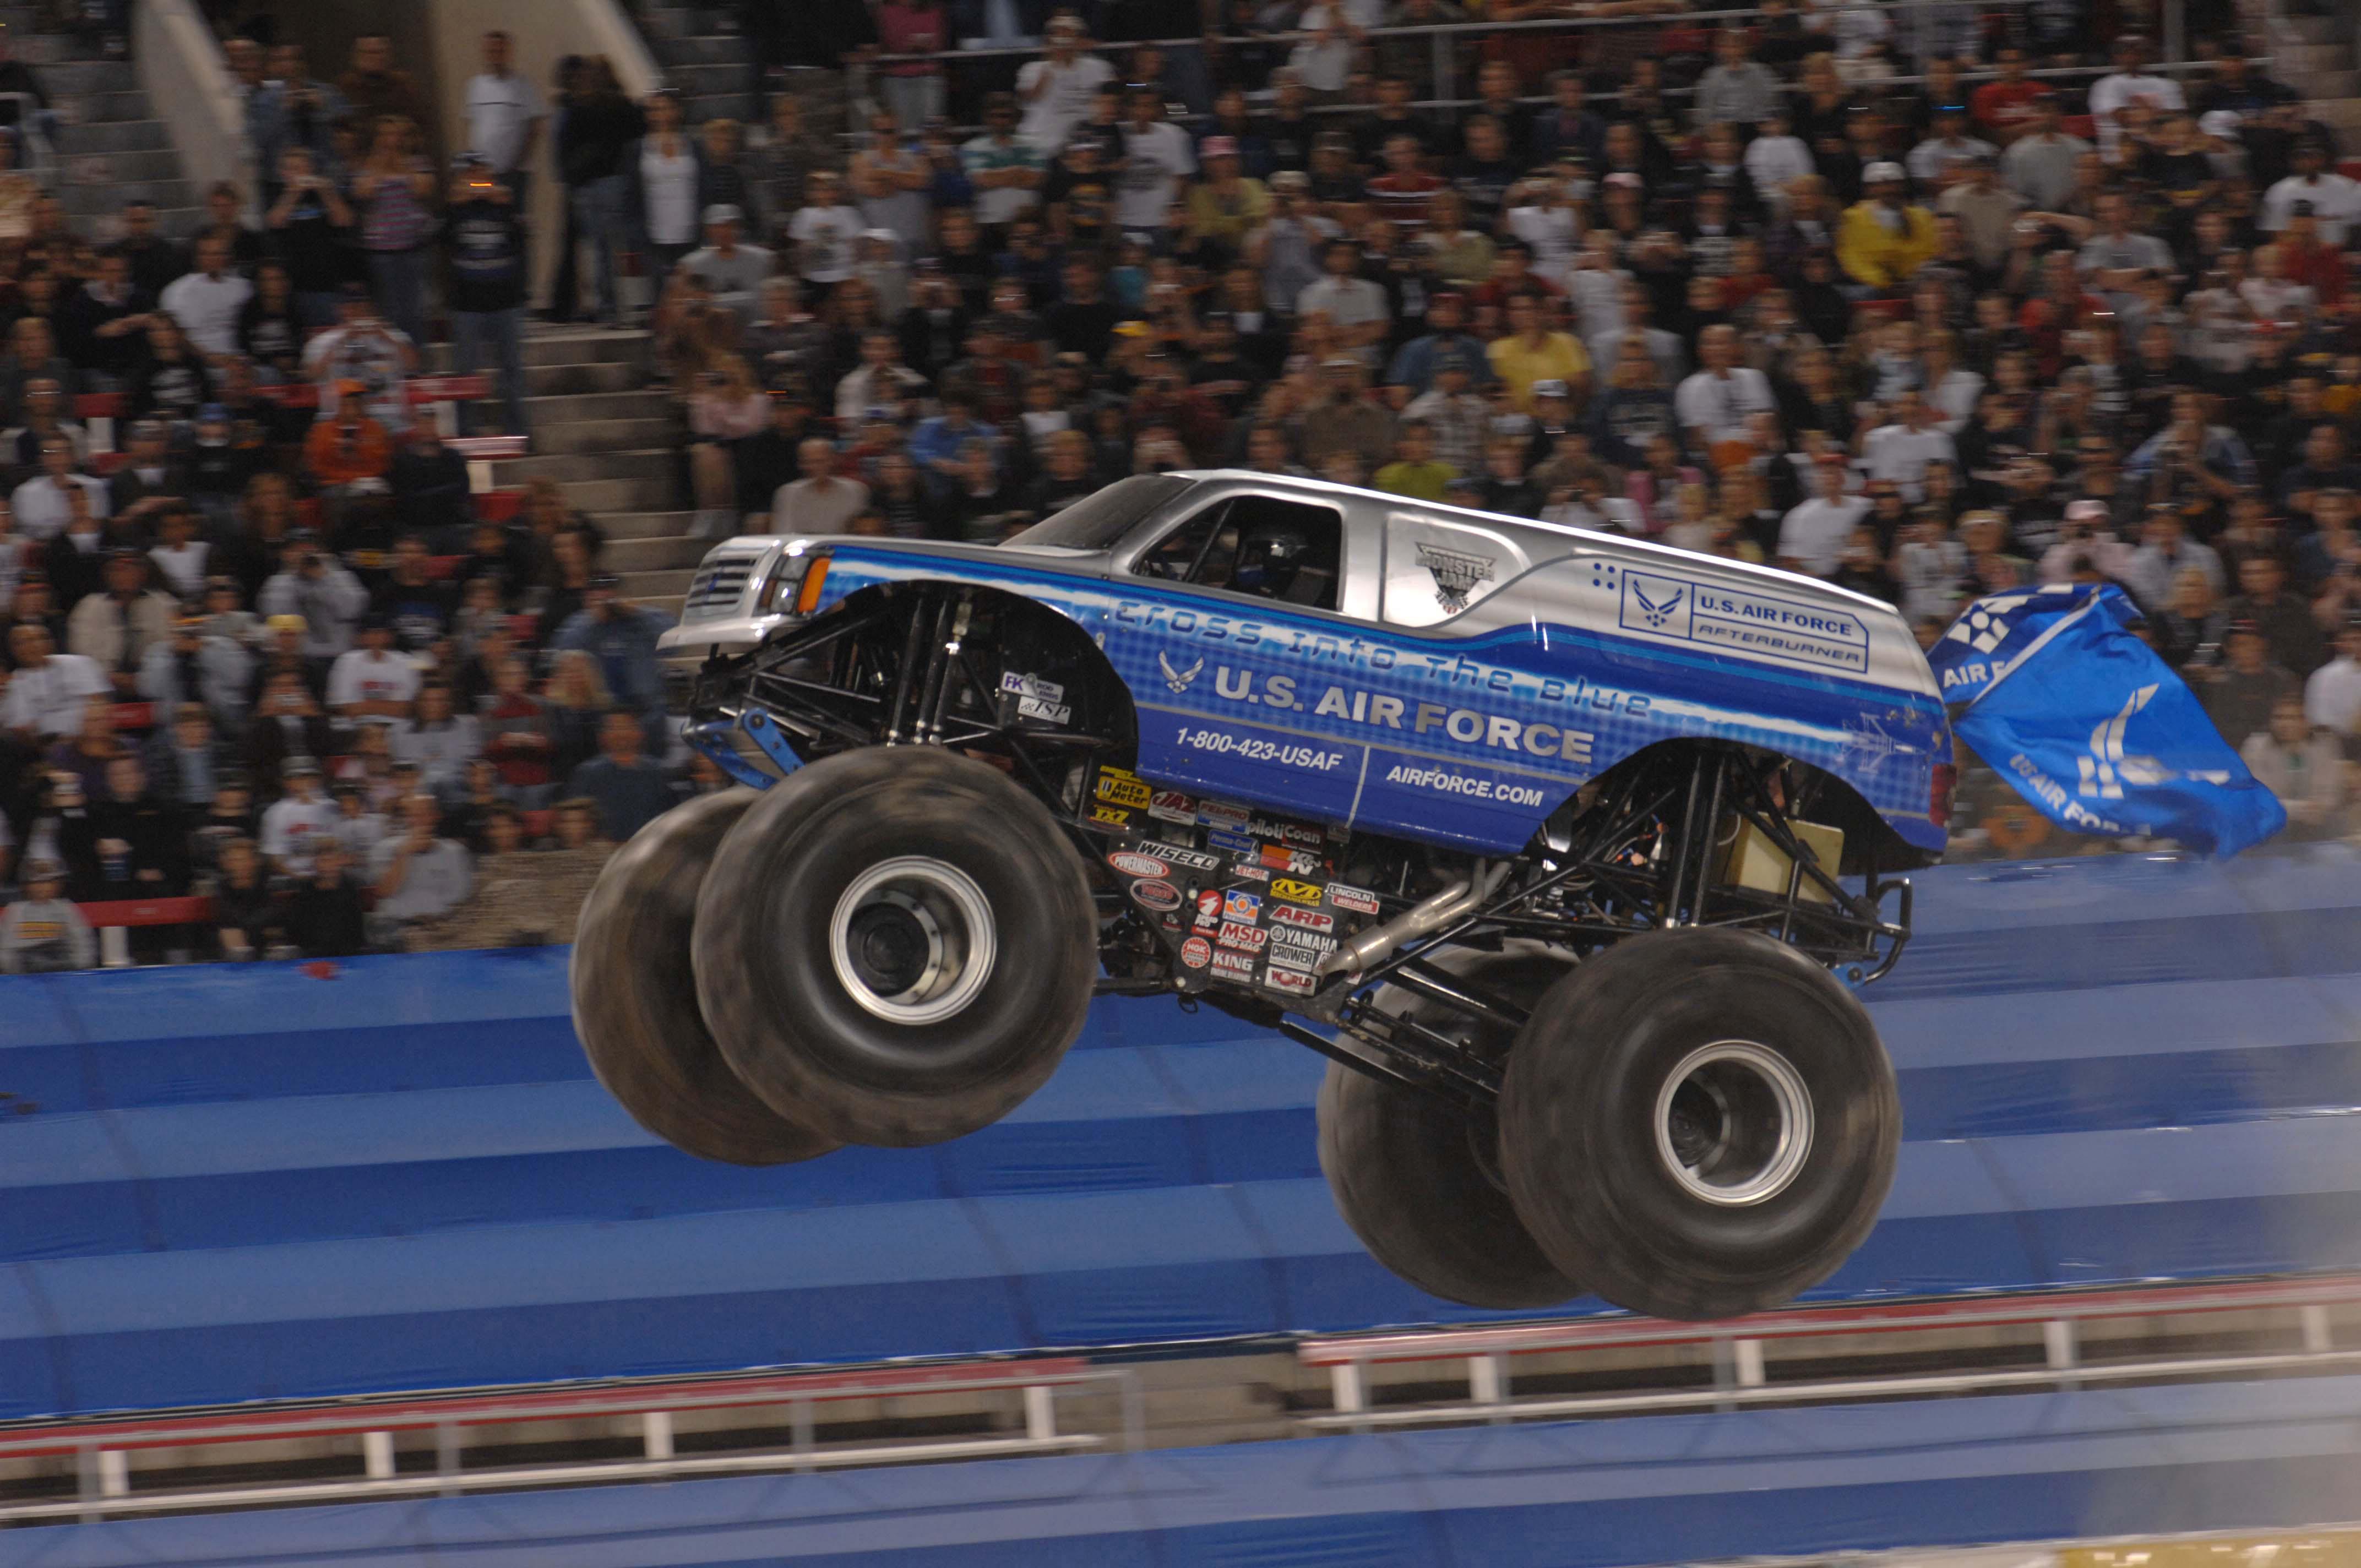 Monster Truck Wikiwand - Monster car show